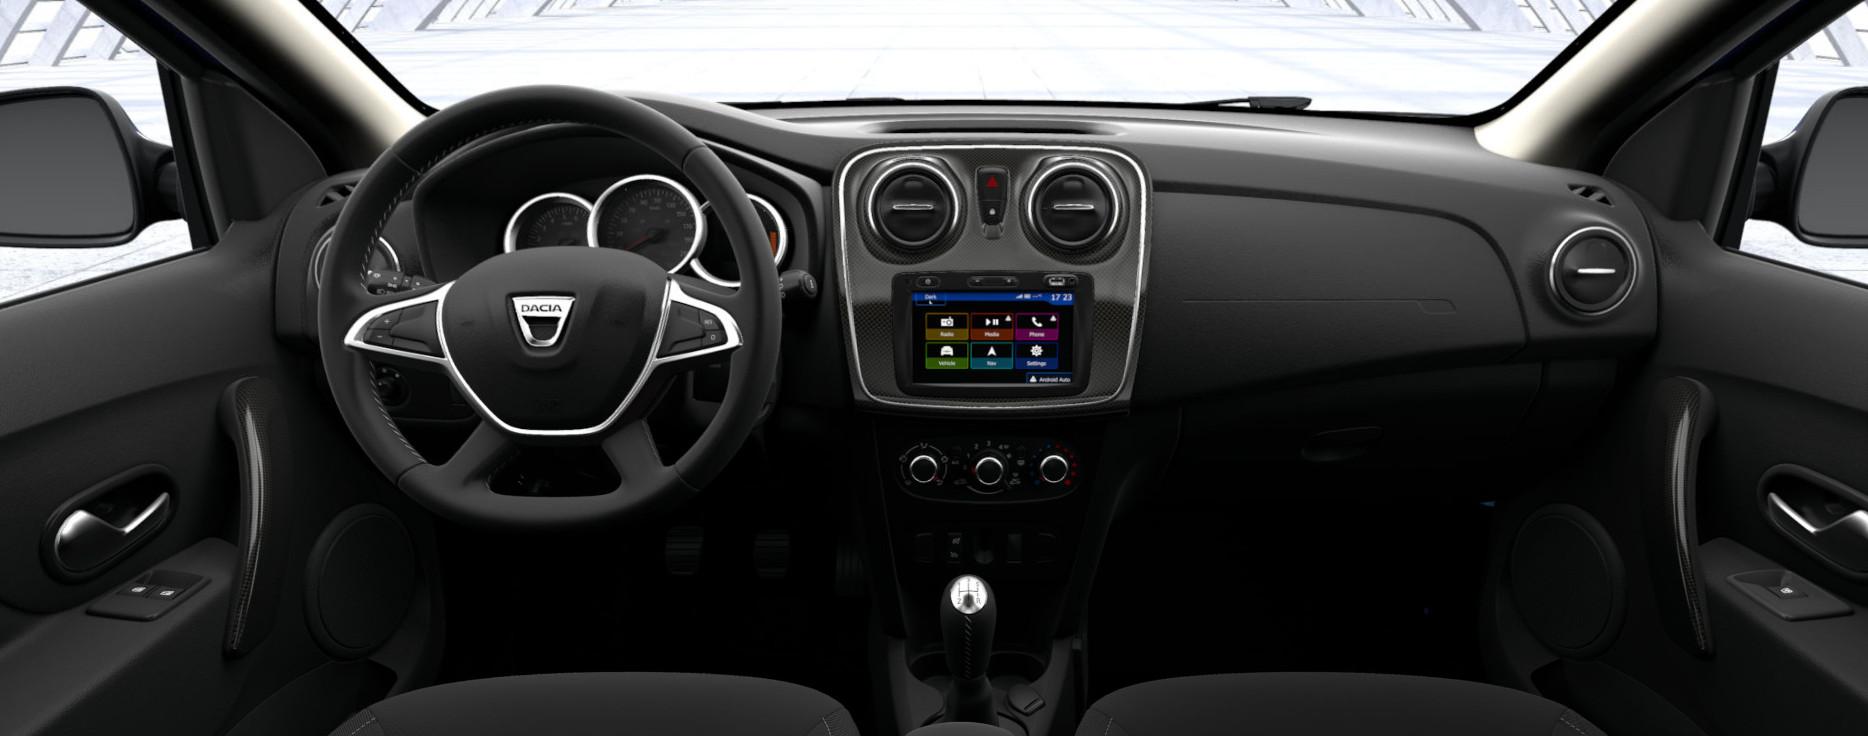 Dacia-Sandero-leasen-4